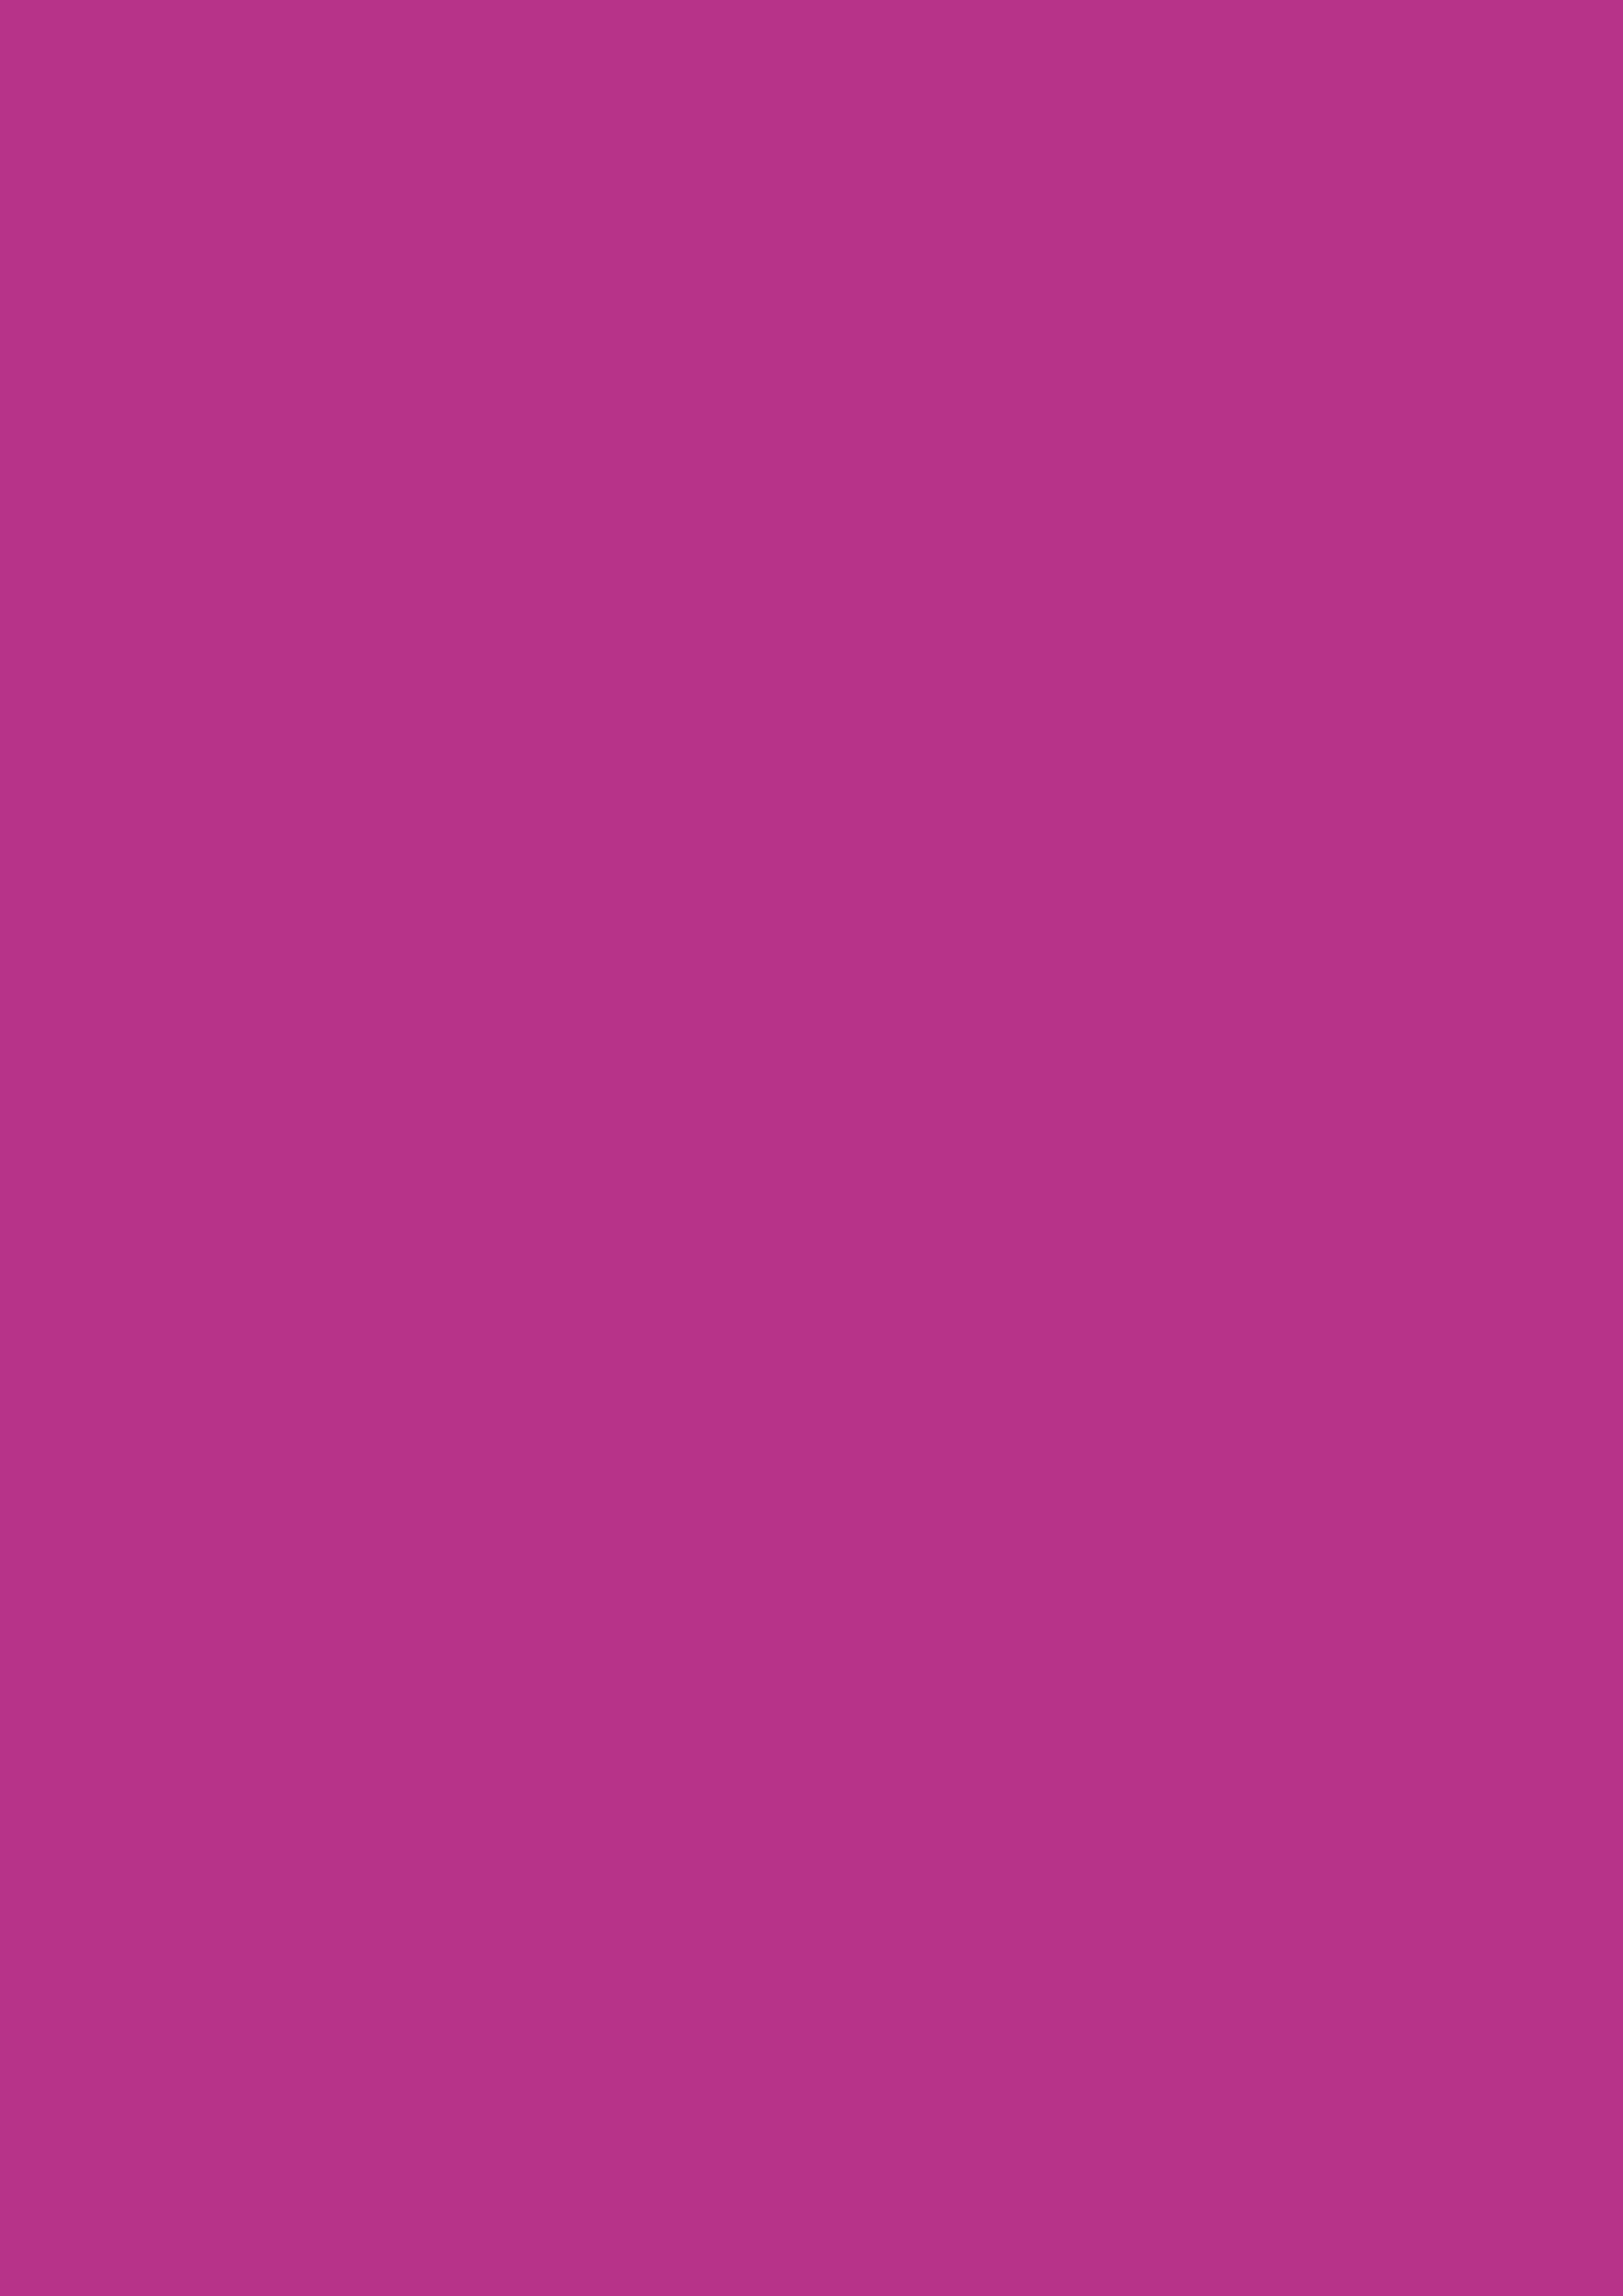 2480x3508 Fandango Solid Color Background